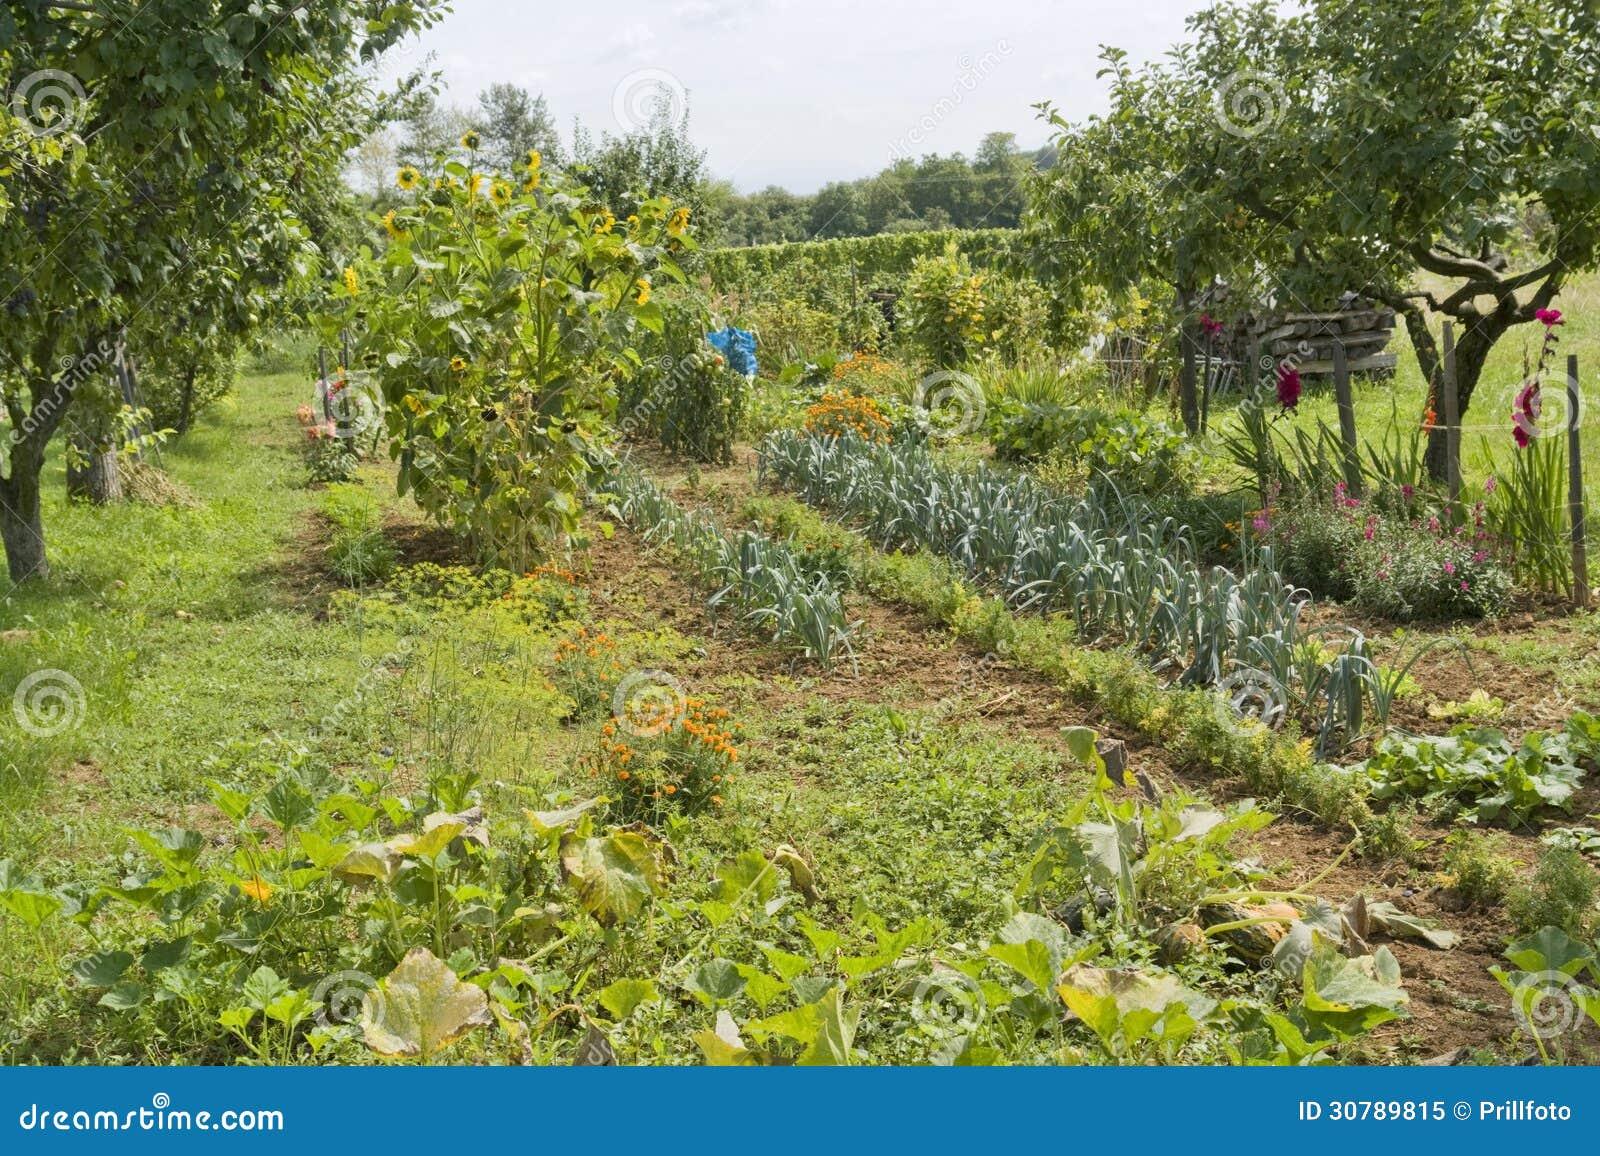 Allotment Garden Royalty Free Stock Photo Image 30789815